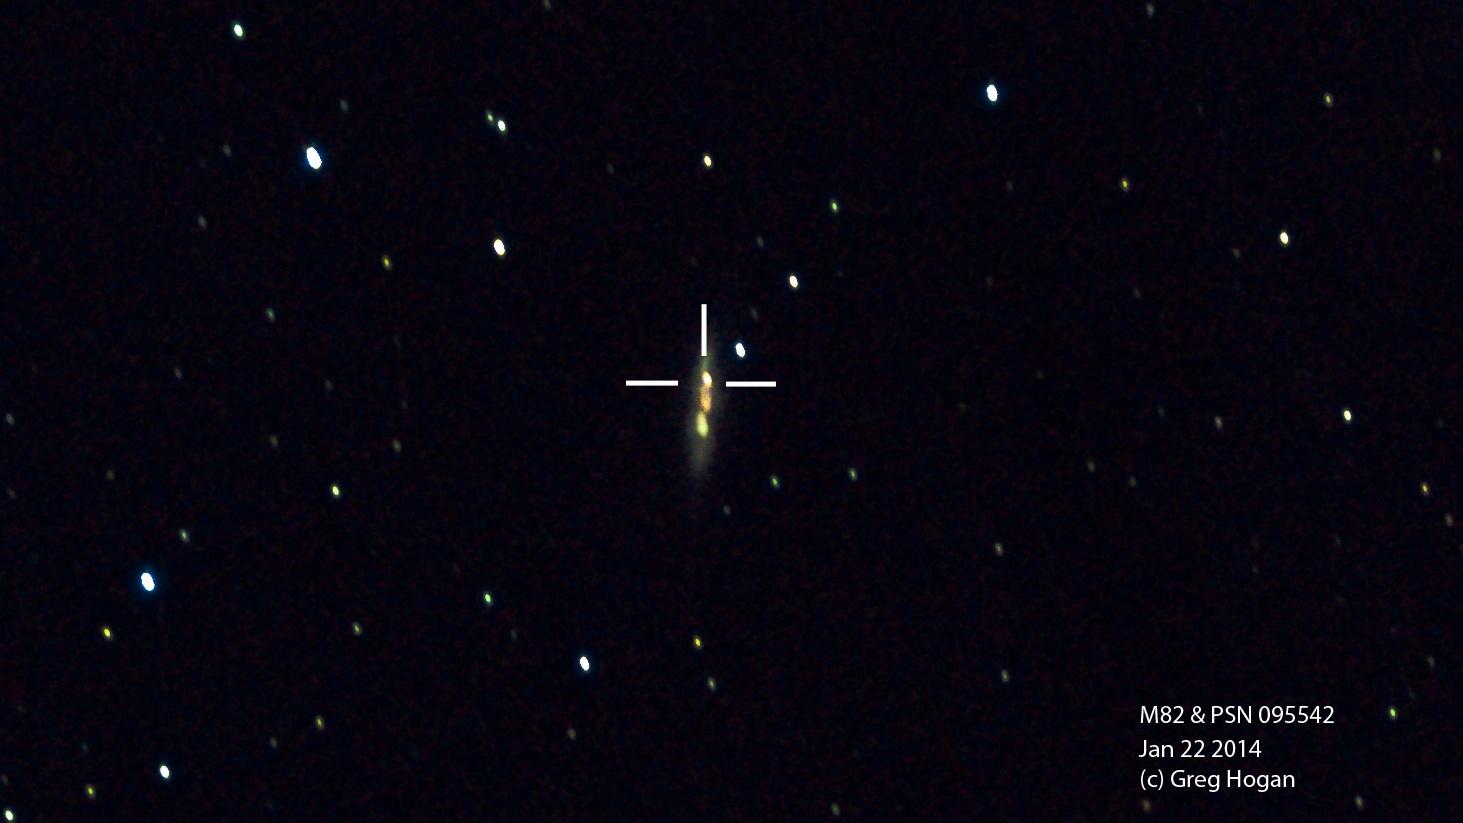 New Supernova in M82 by Greg Hogan